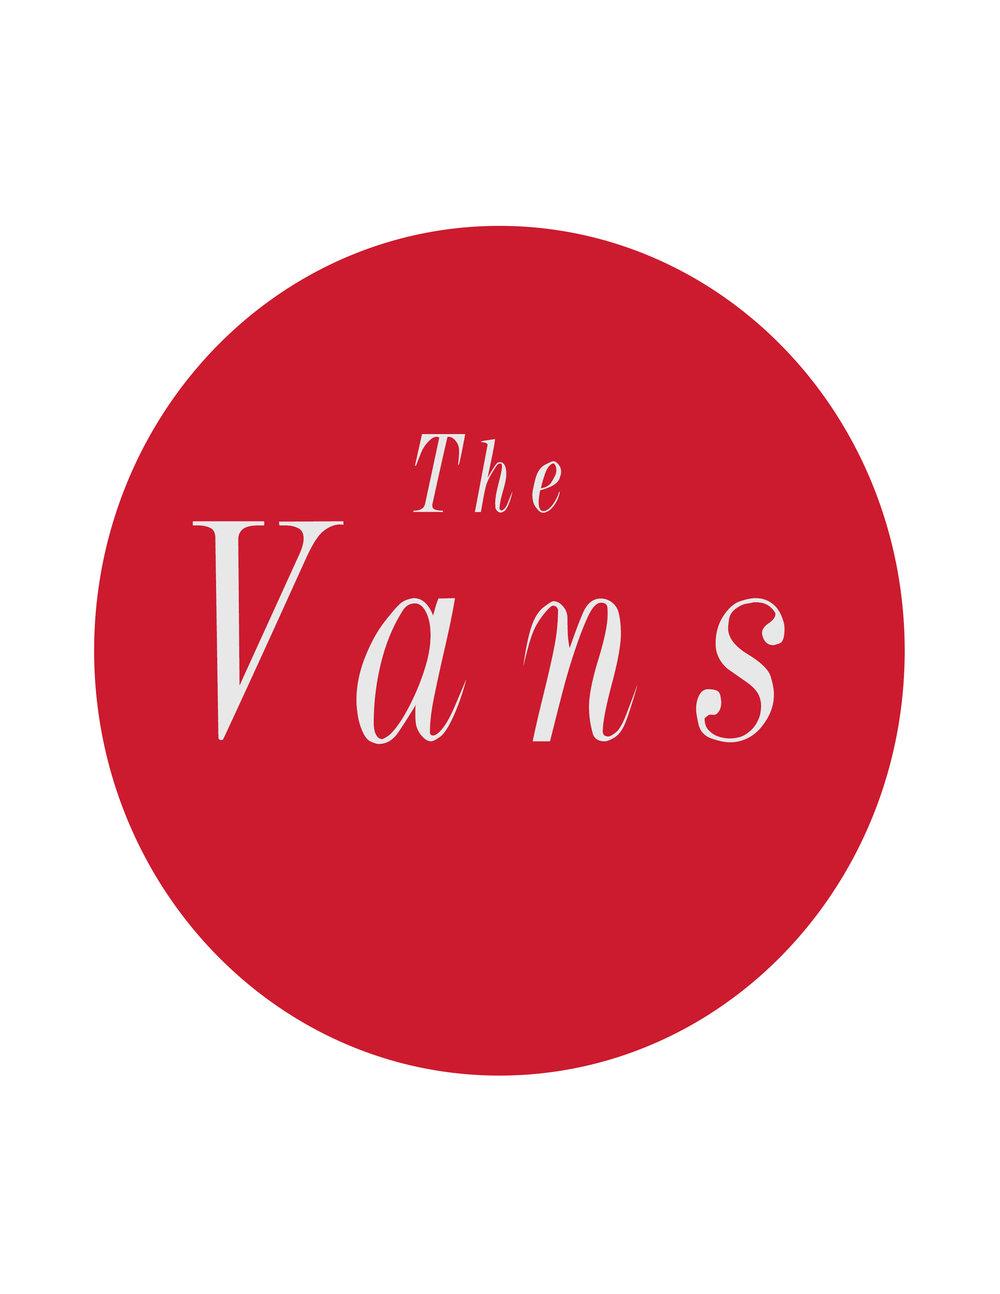 theVans.jpg